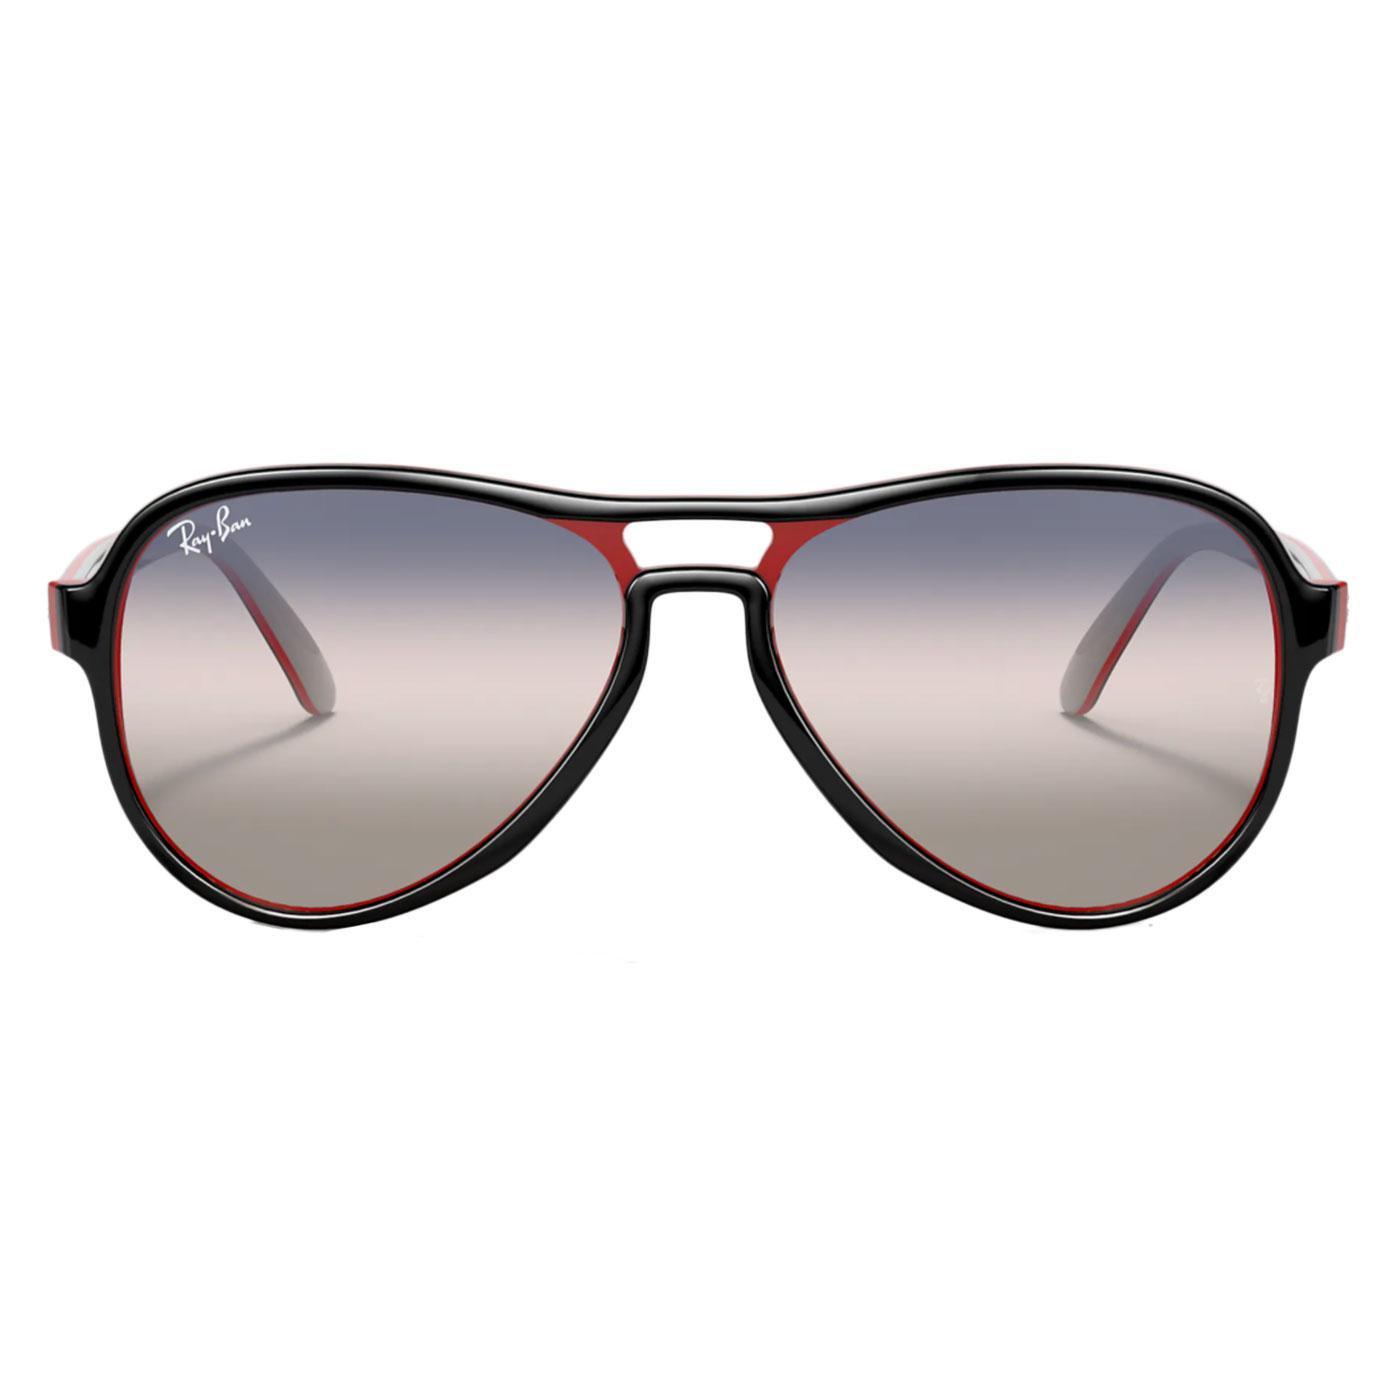 Vagabond RAY-BAN Retro 70s Aviator Sunglasses BR